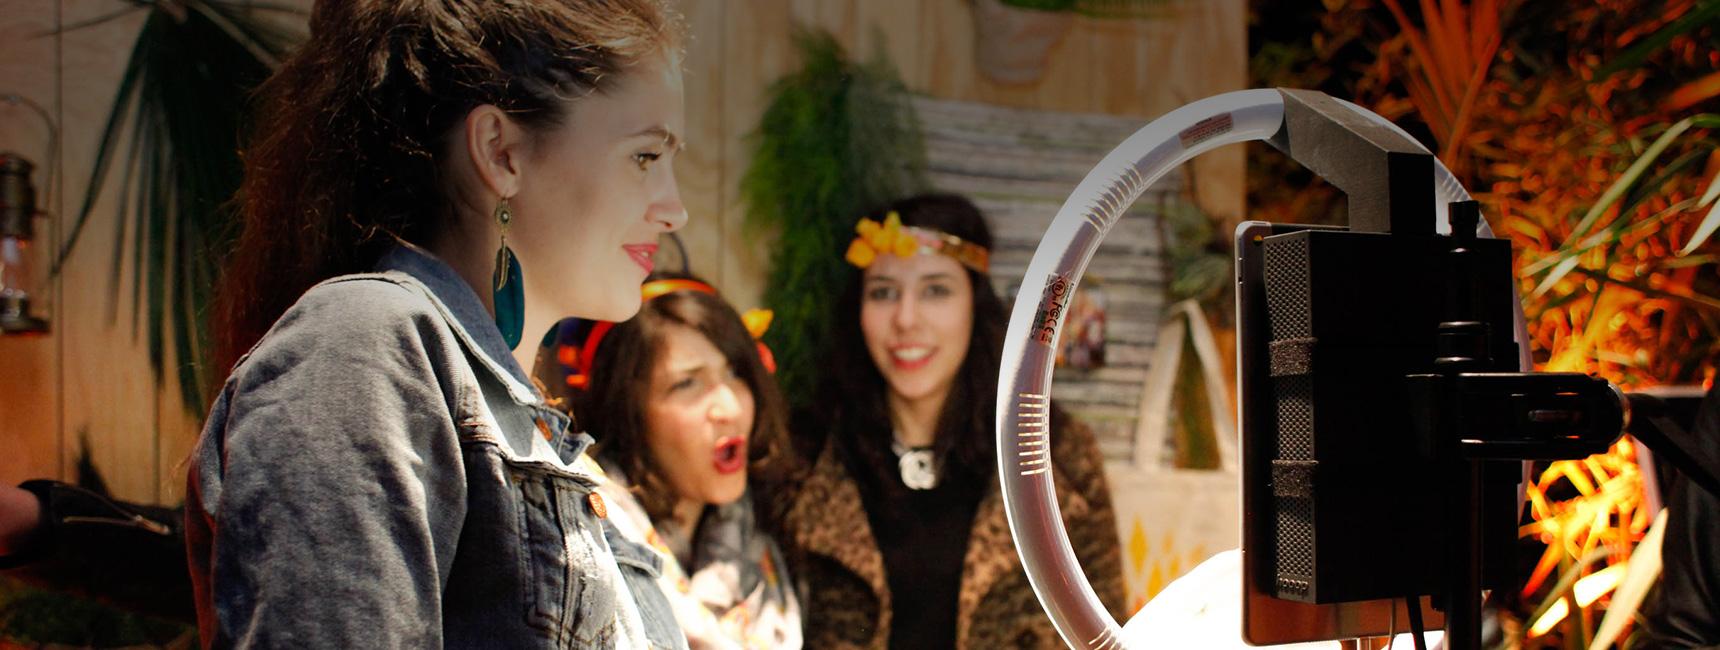 Corona - Animations CHD - Keemia Shopper Marketing - Agence d'activation shopper marketing phygitale